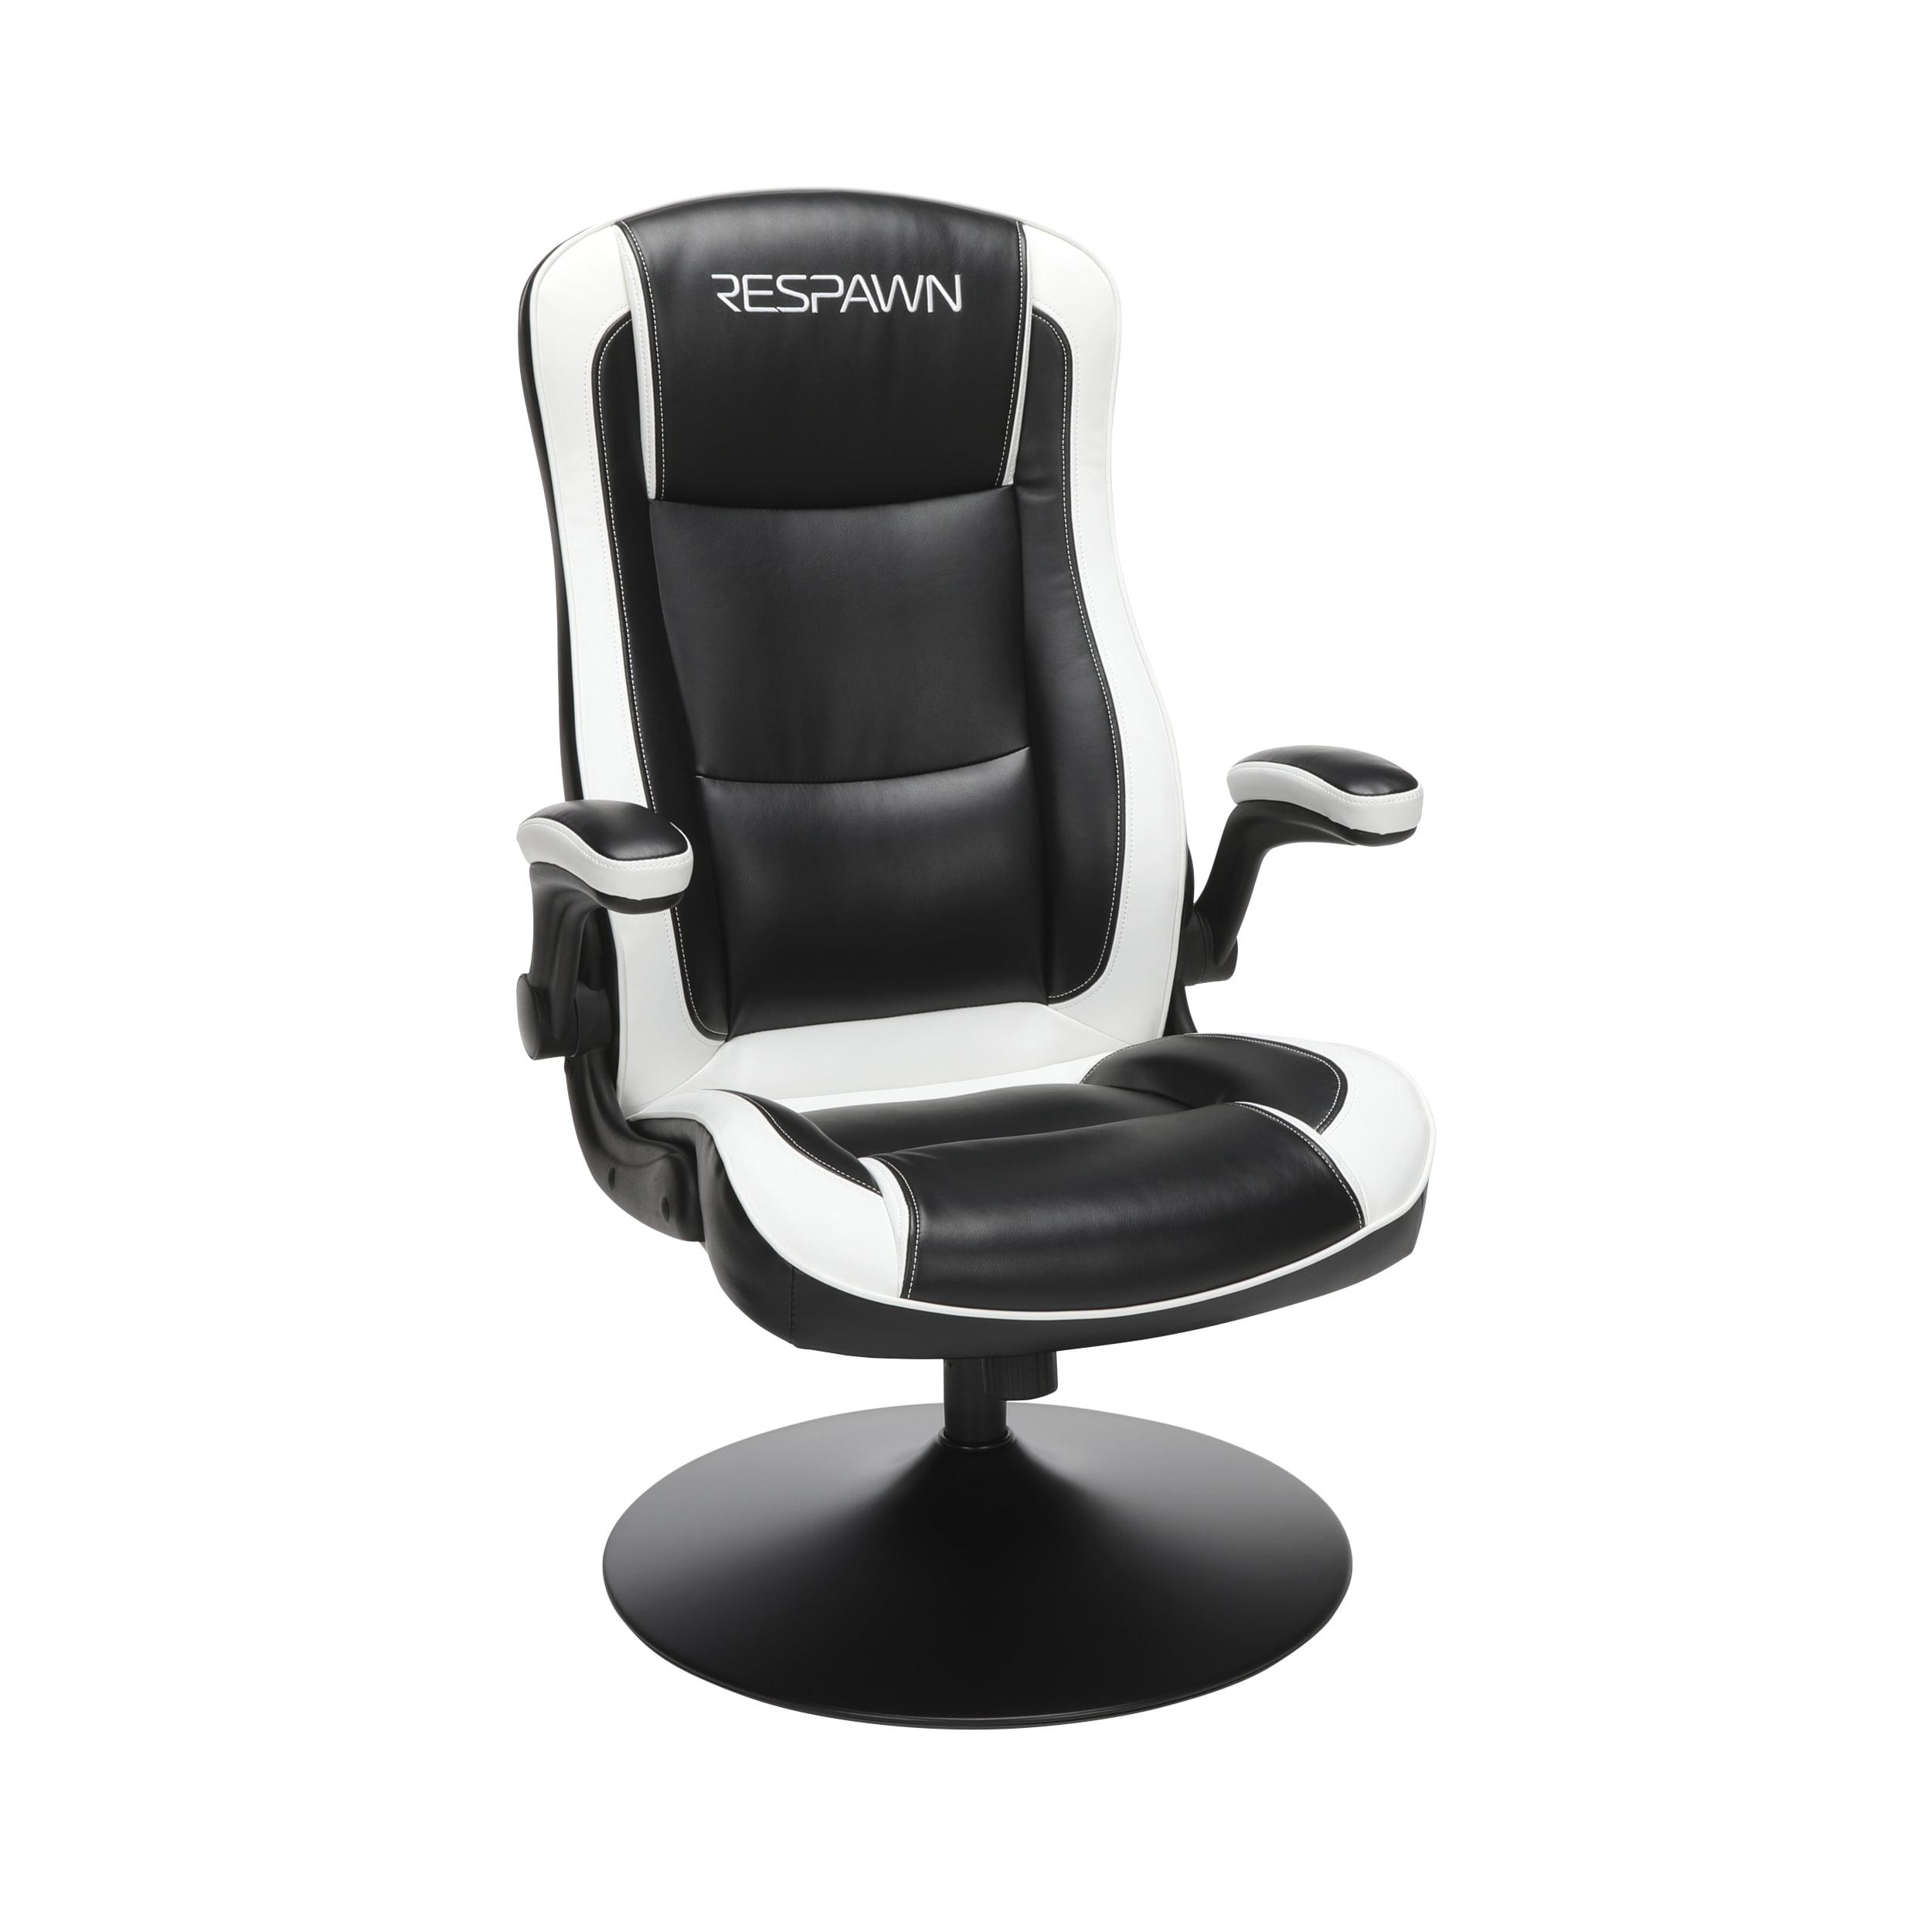 RESPAWN-800 Racing Style Gaming Rocker Chair, Rocking